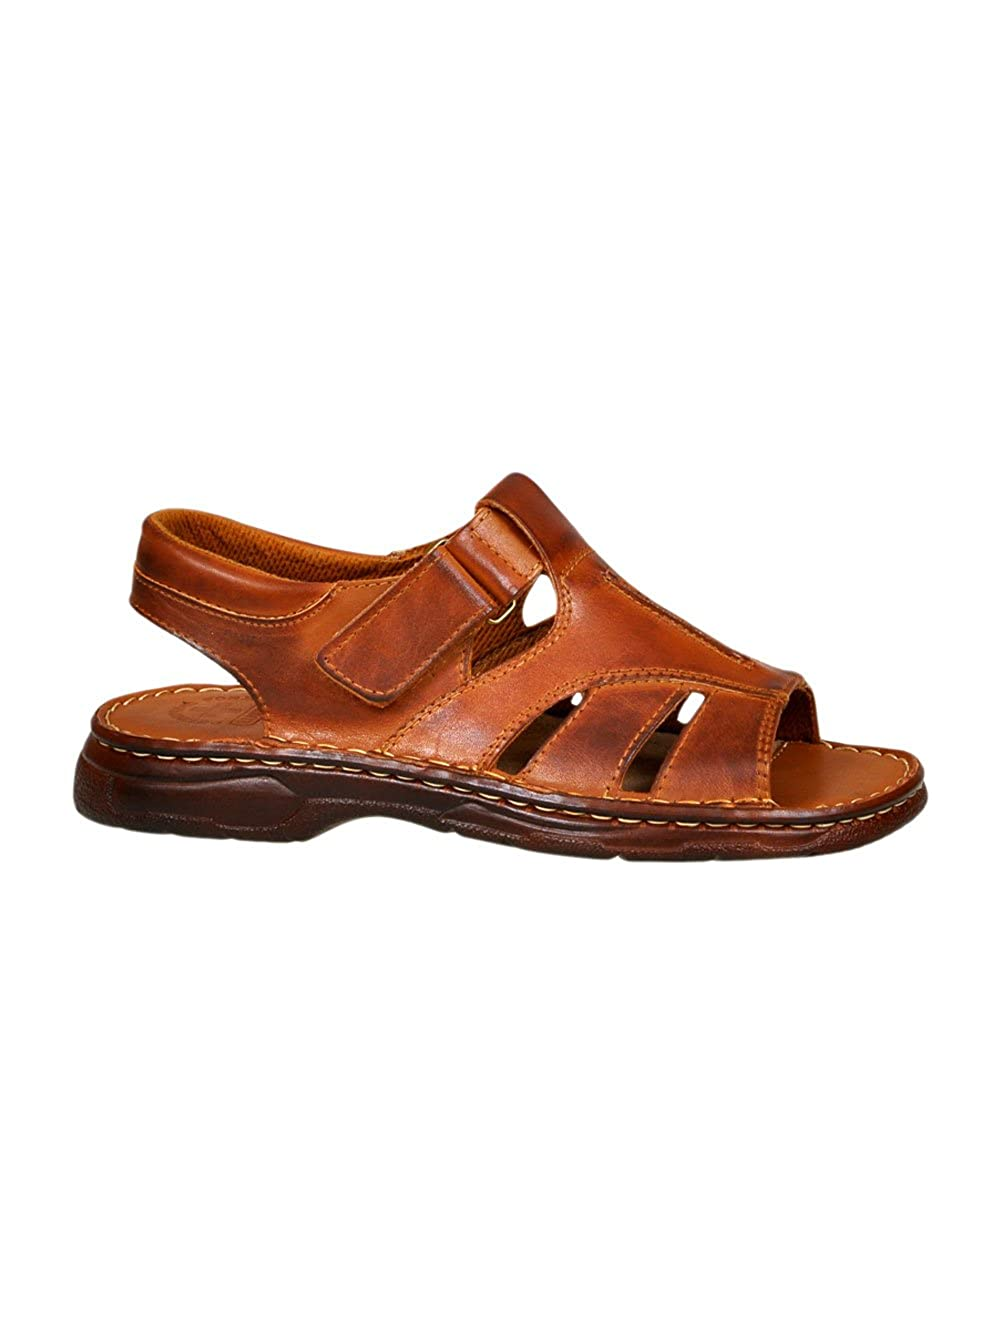 Mens Genuine Buffalo Leather Sandals Model 835